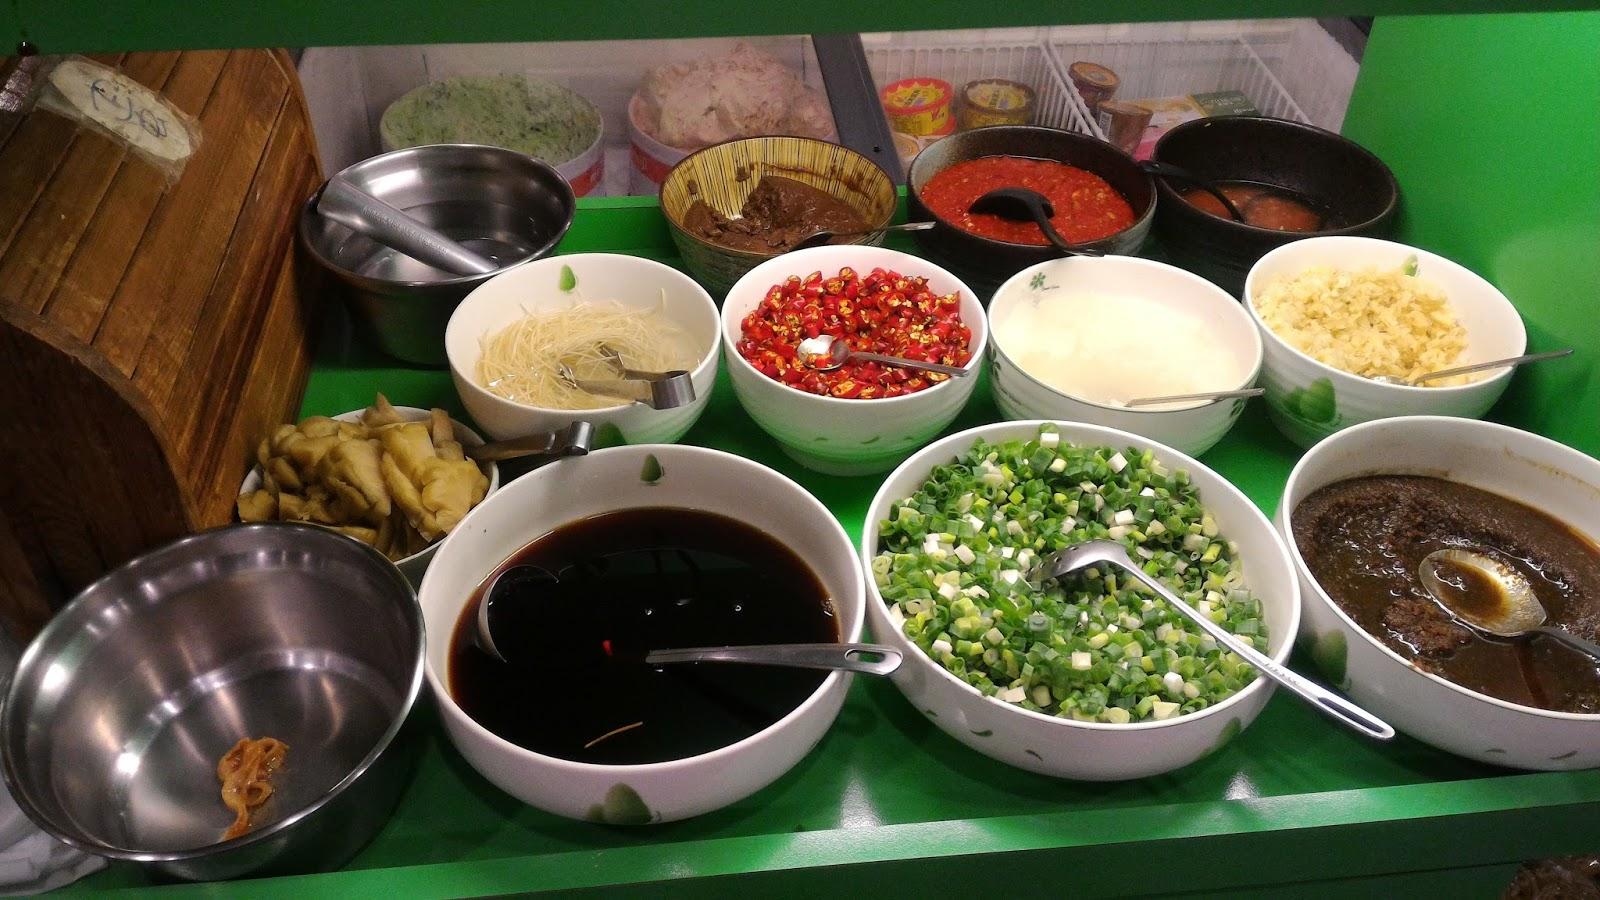 P 20160725 181724 - [食記] 廣香吃到飽日式涮涮鍋,超多種飲料、冰品及甜點!